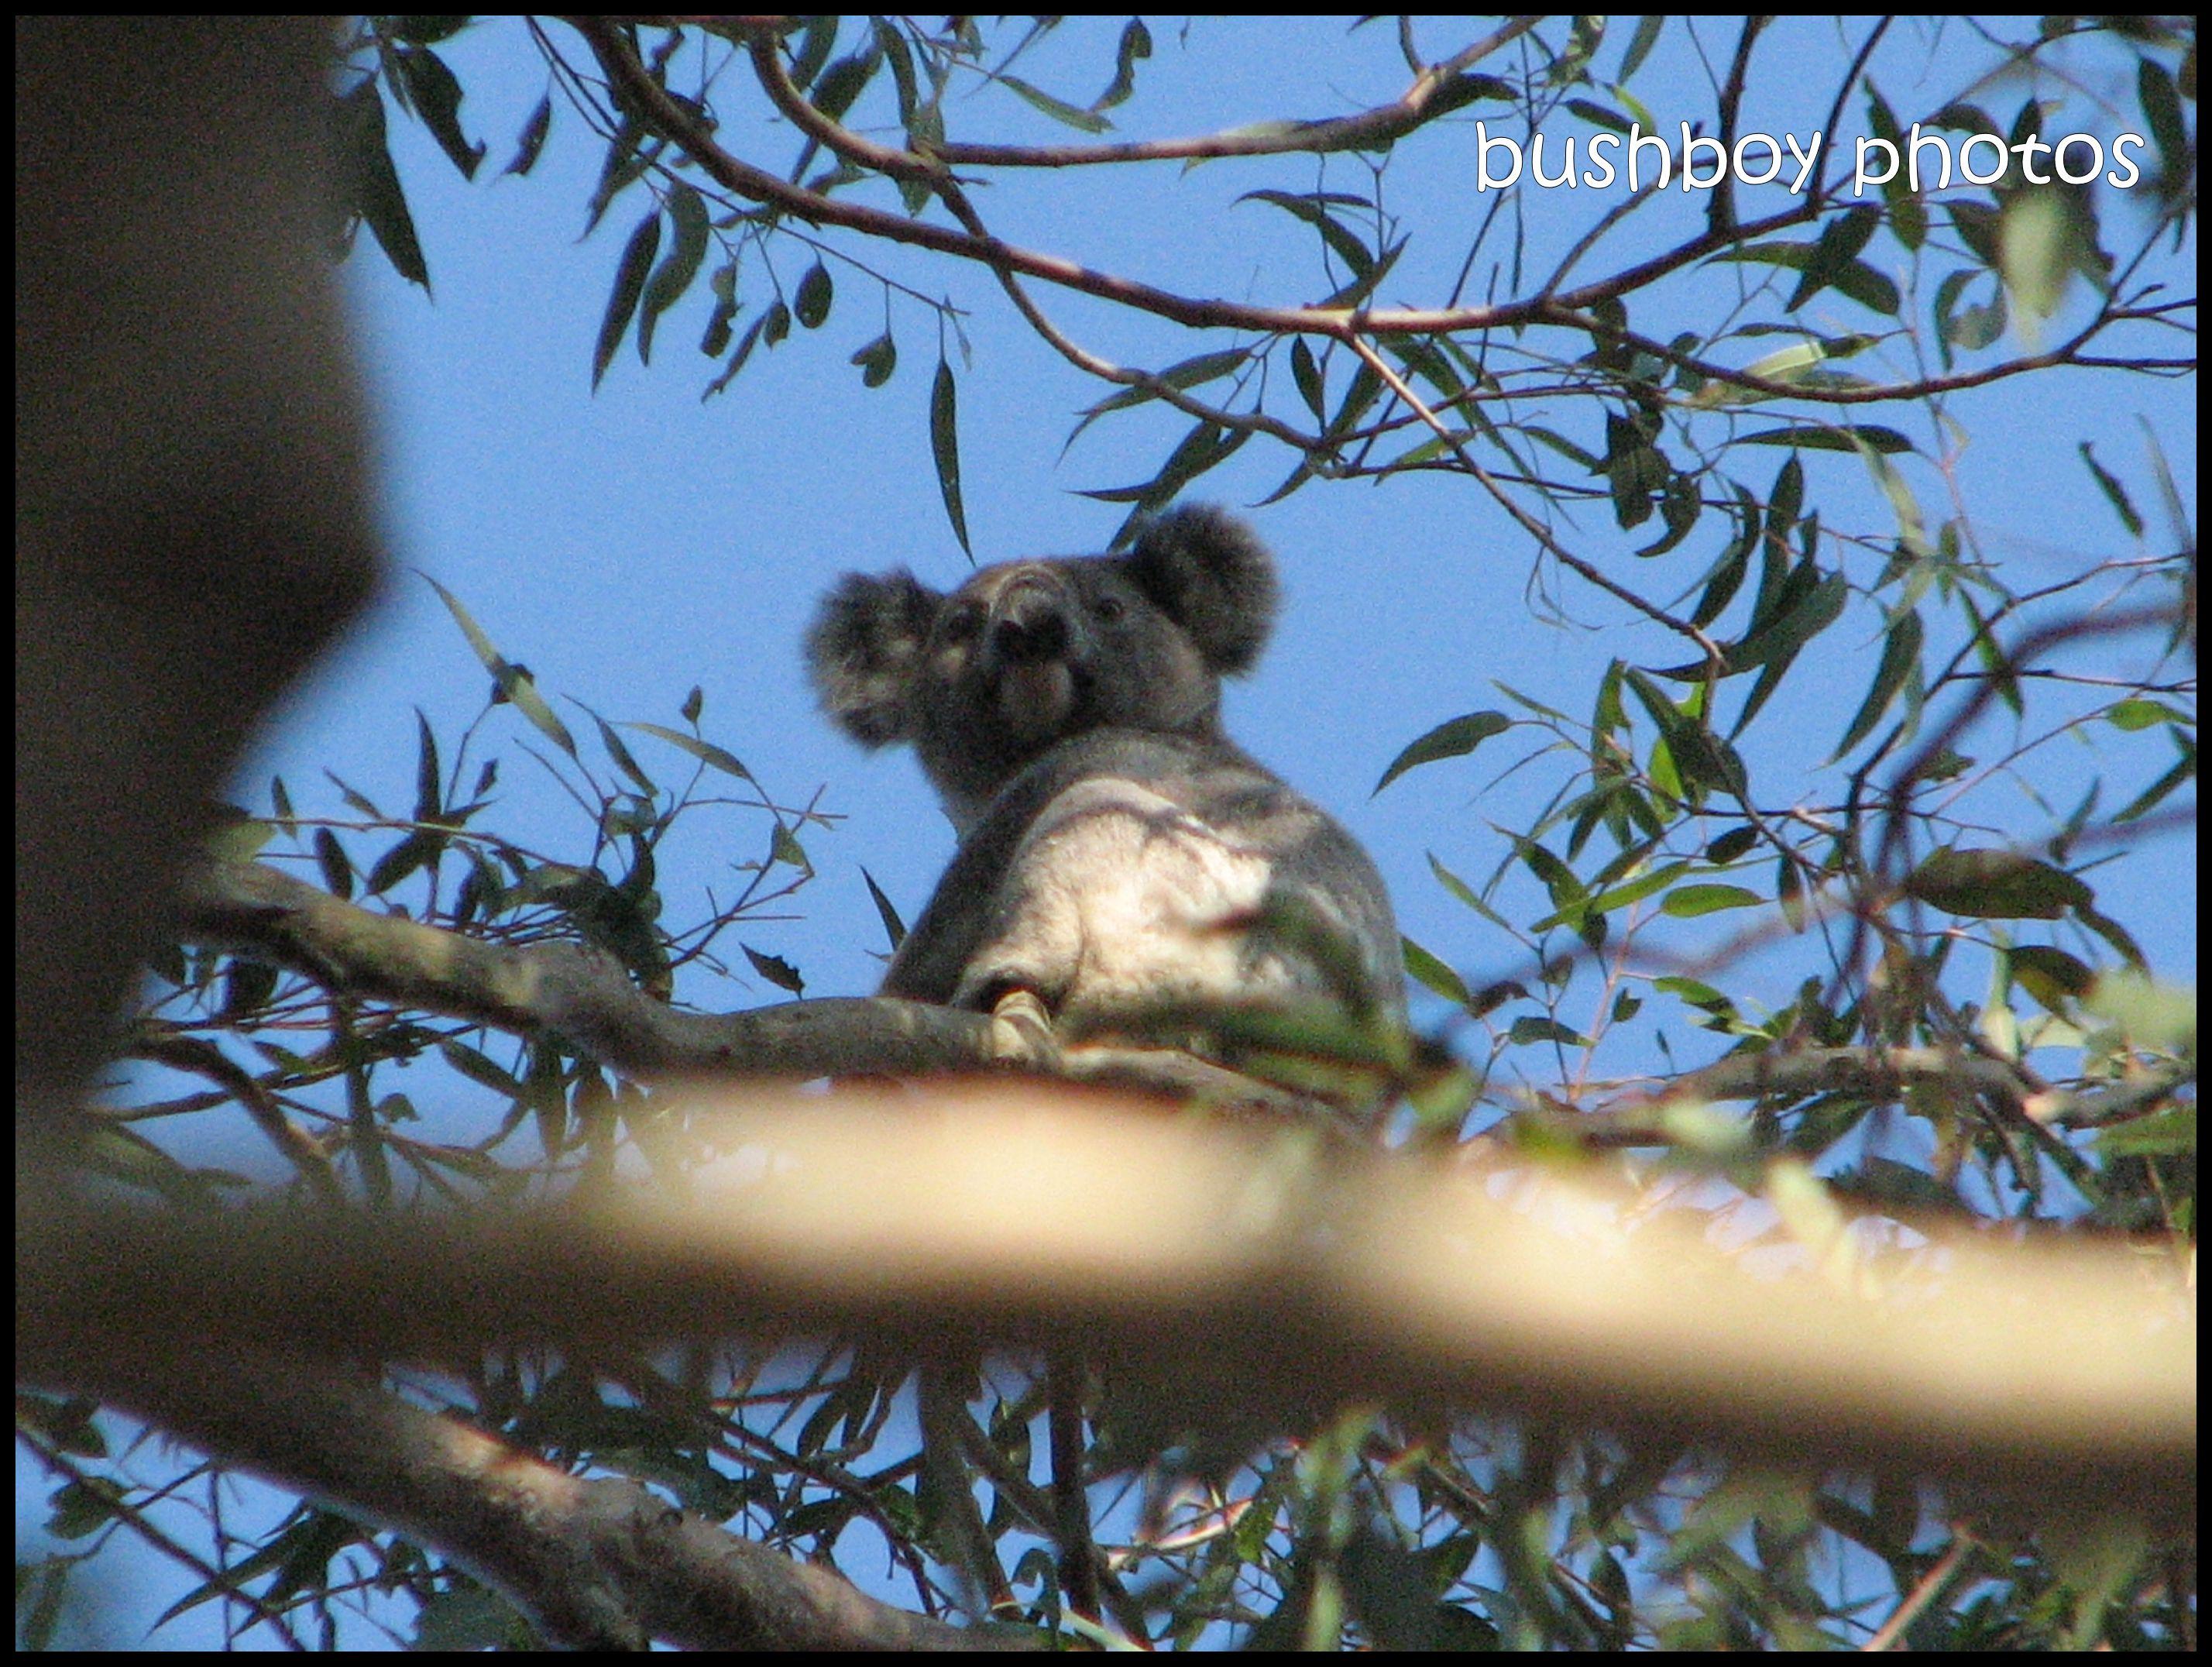 koala1_close_looking_binna burra__with border_nov 2011